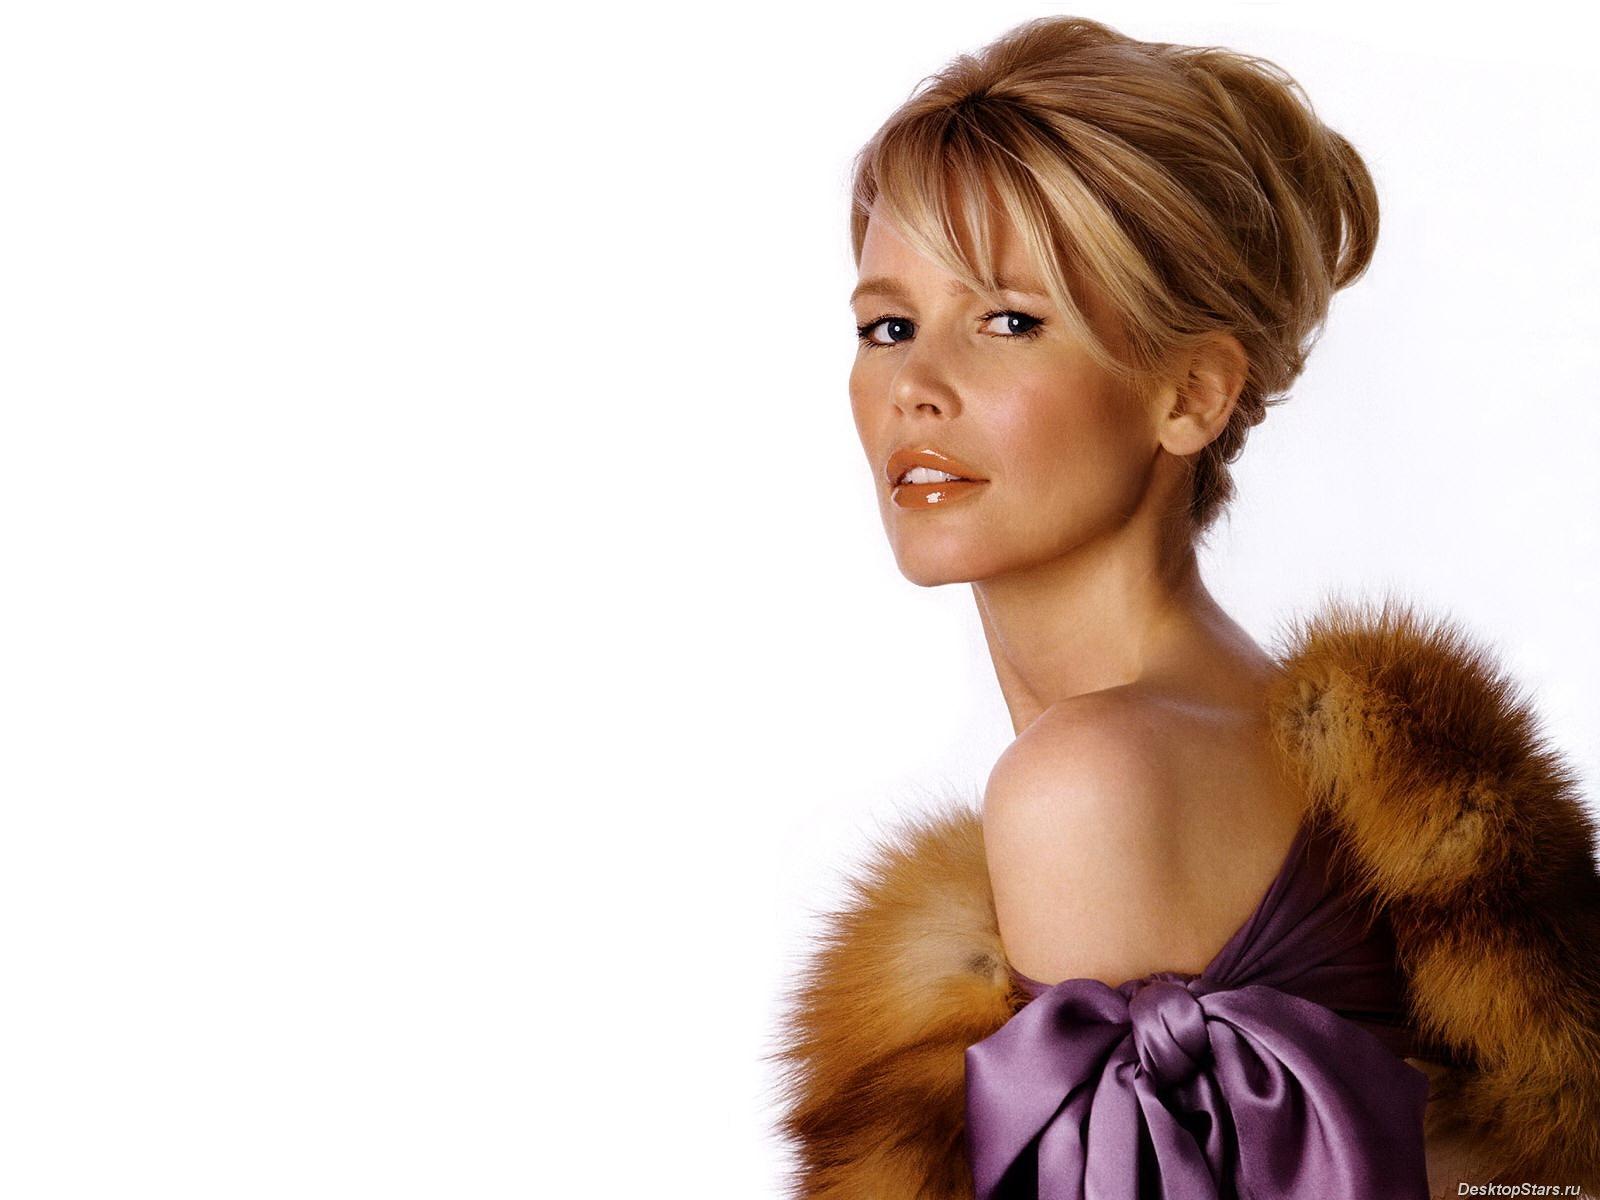 Claudia Schiffer hermoso fondo de pantalla  4 - 1600x1200 Fondos de ... 93eee754cbe4